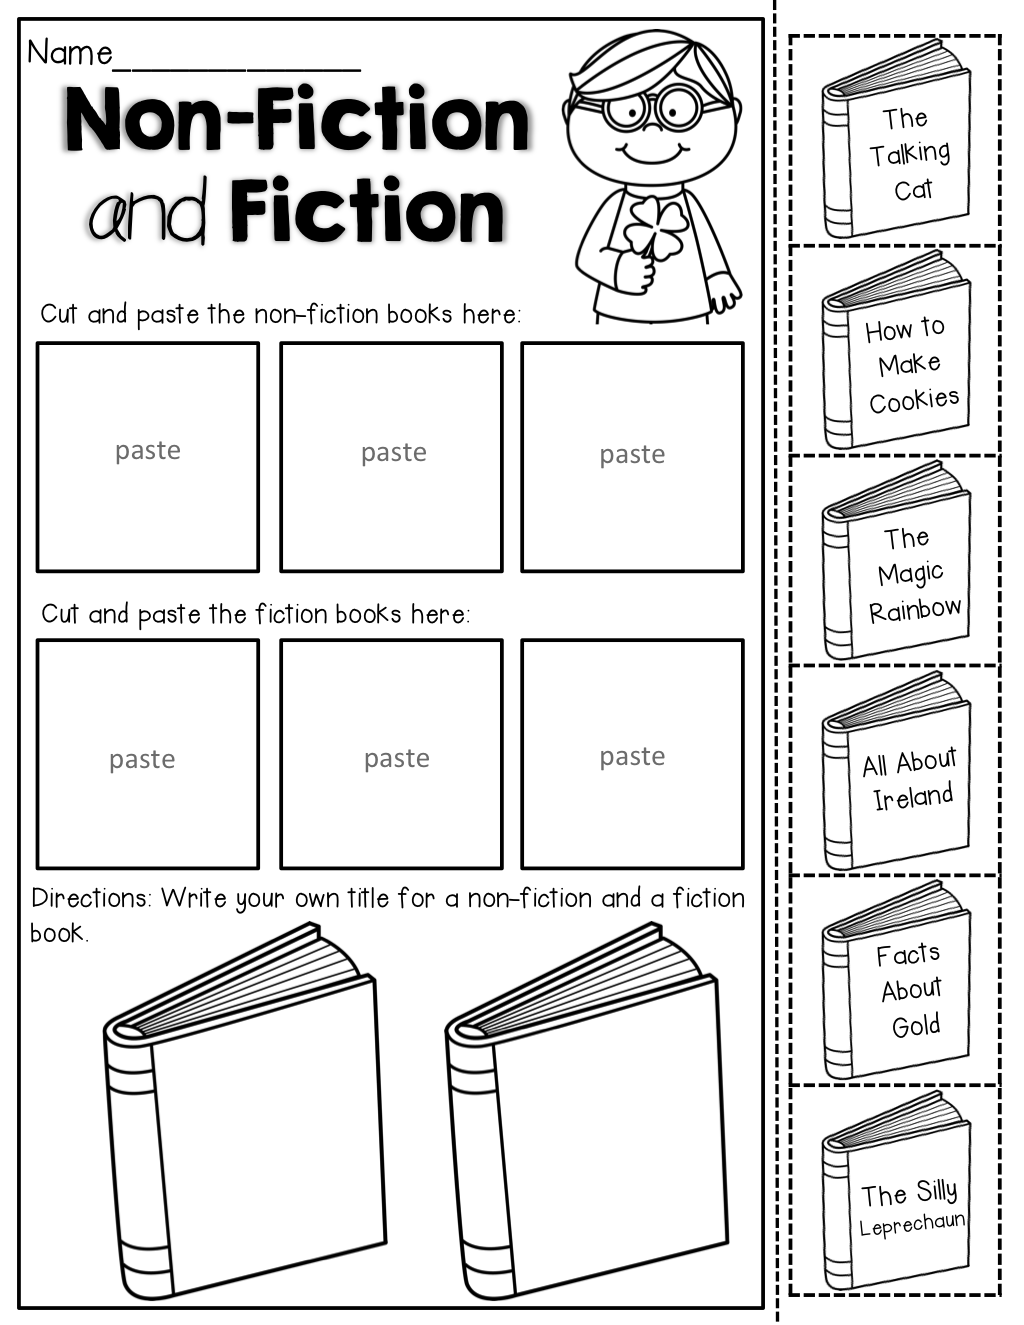 hight resolution of https://dubaikhalifas.com/class-visit-worksheet-fiction-vs-non-fiction/